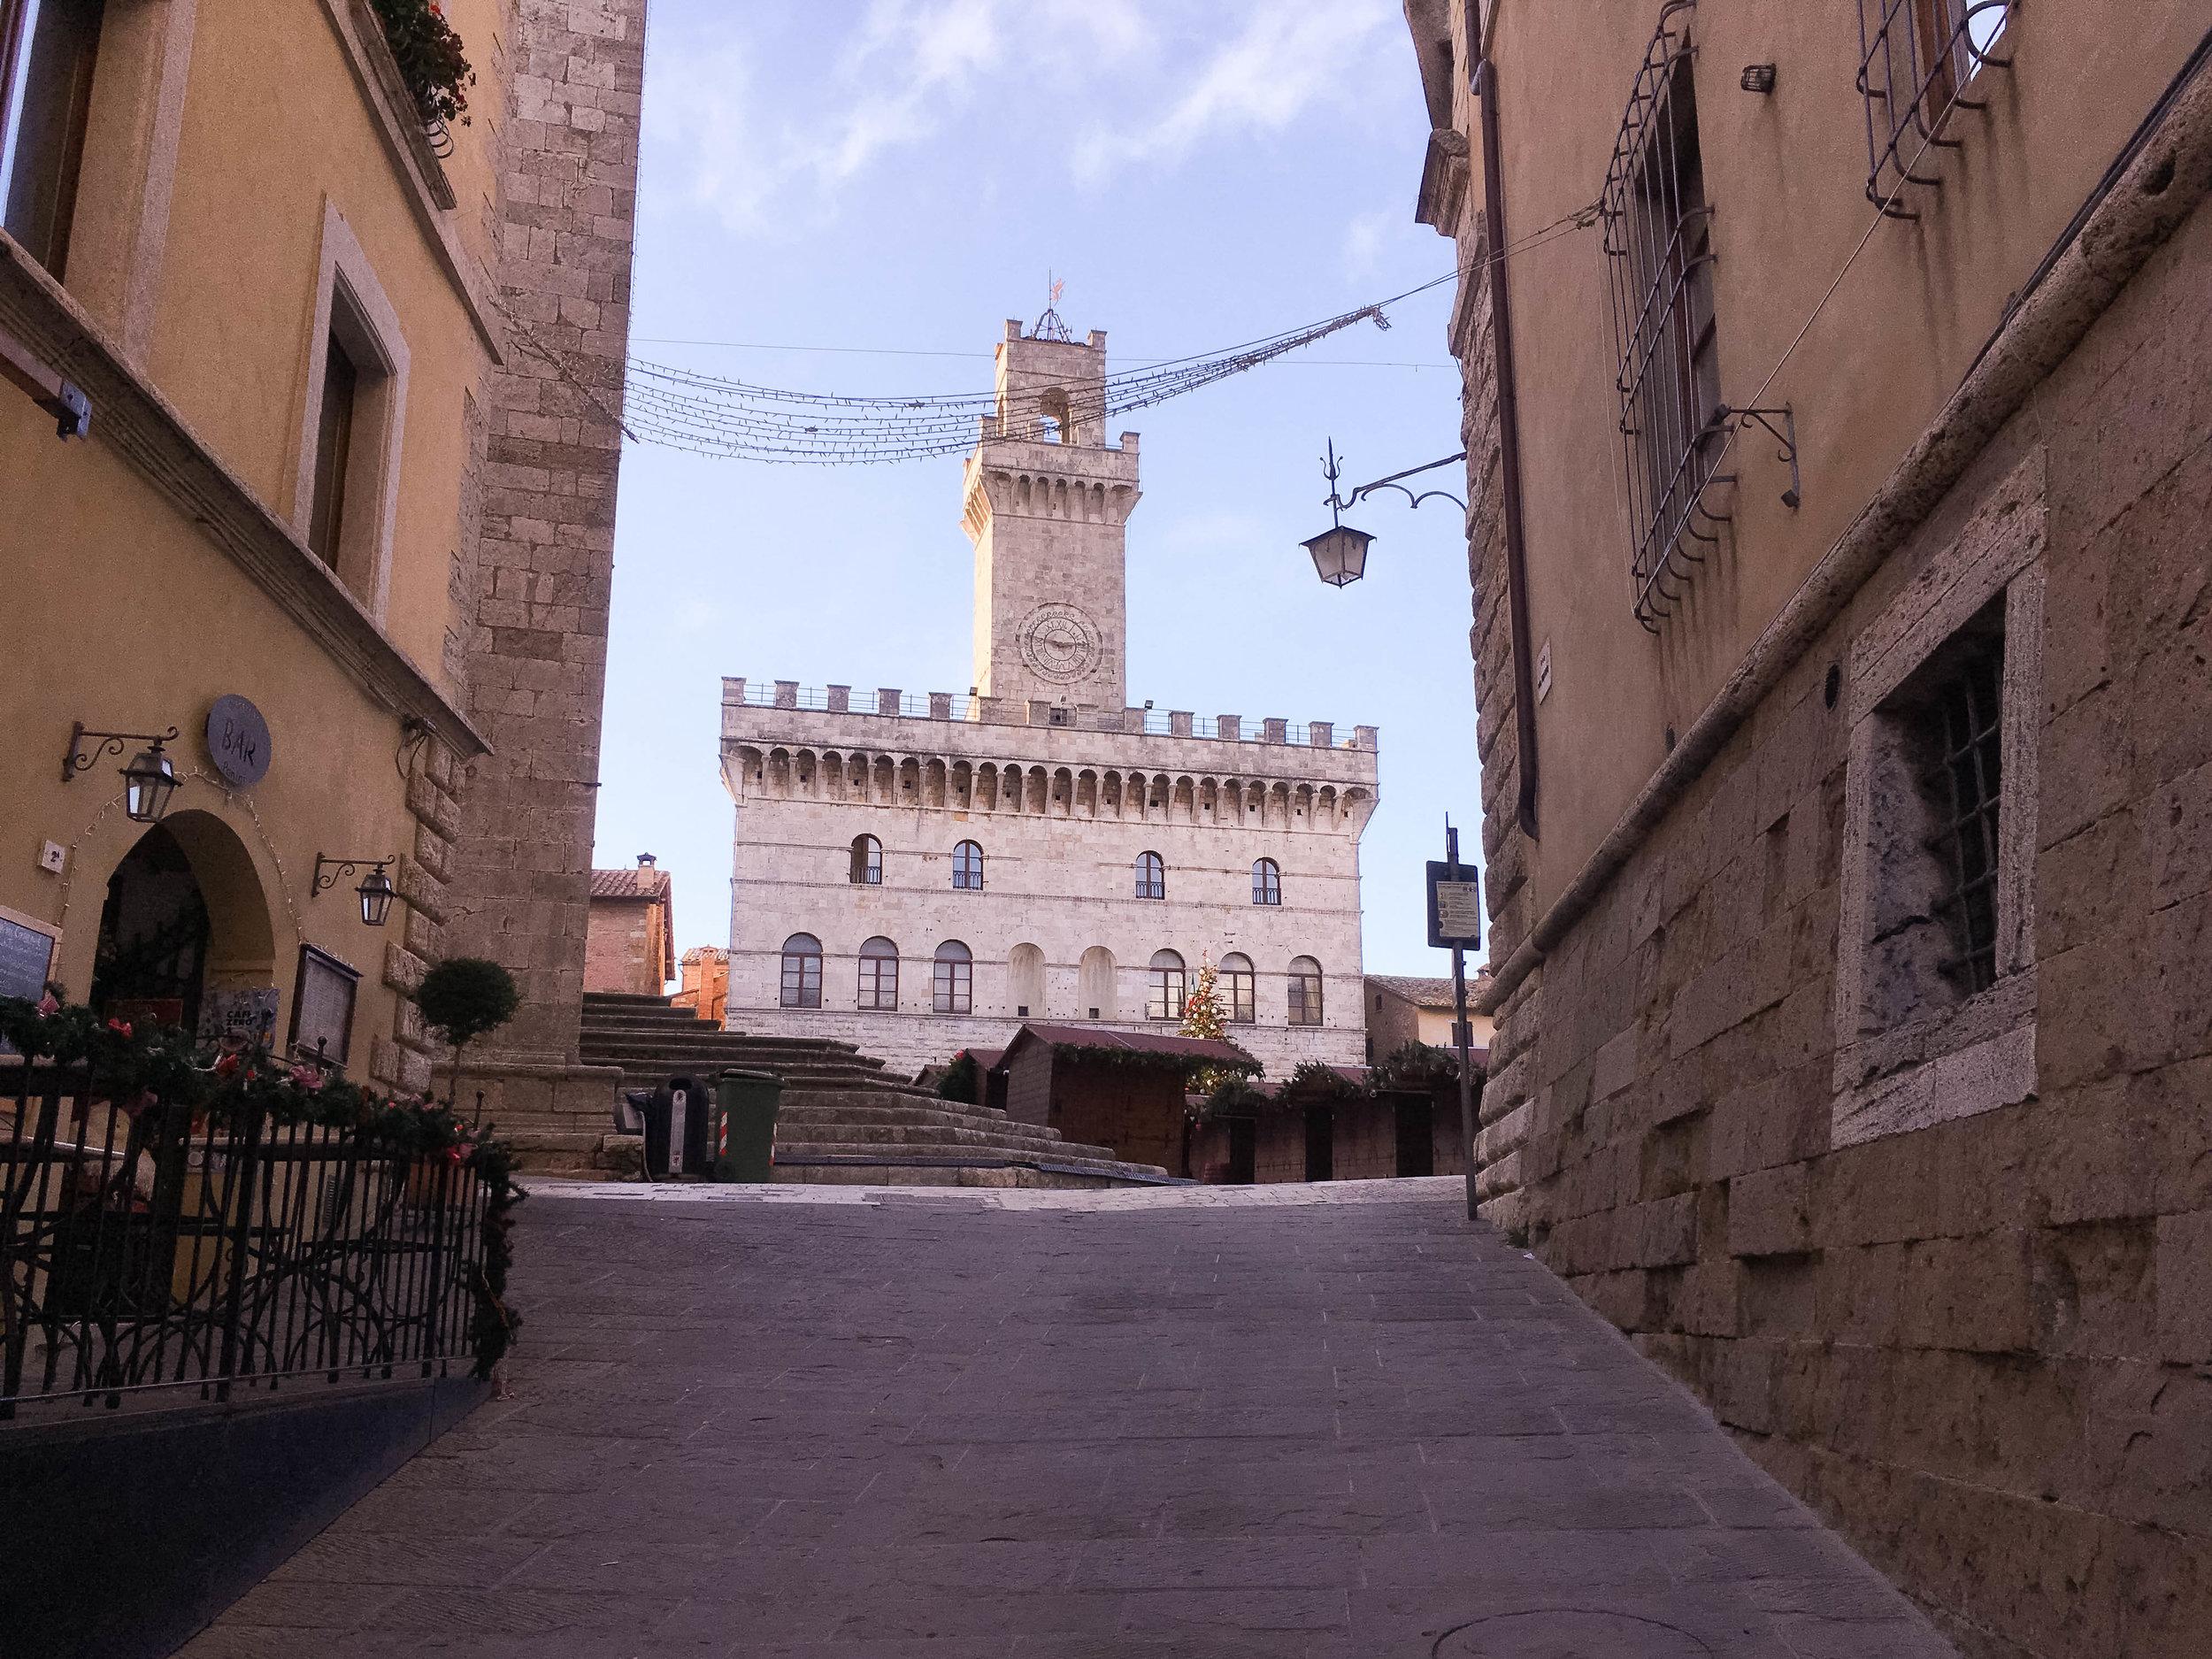 Montepulciano Italy - Destination: Overlooked